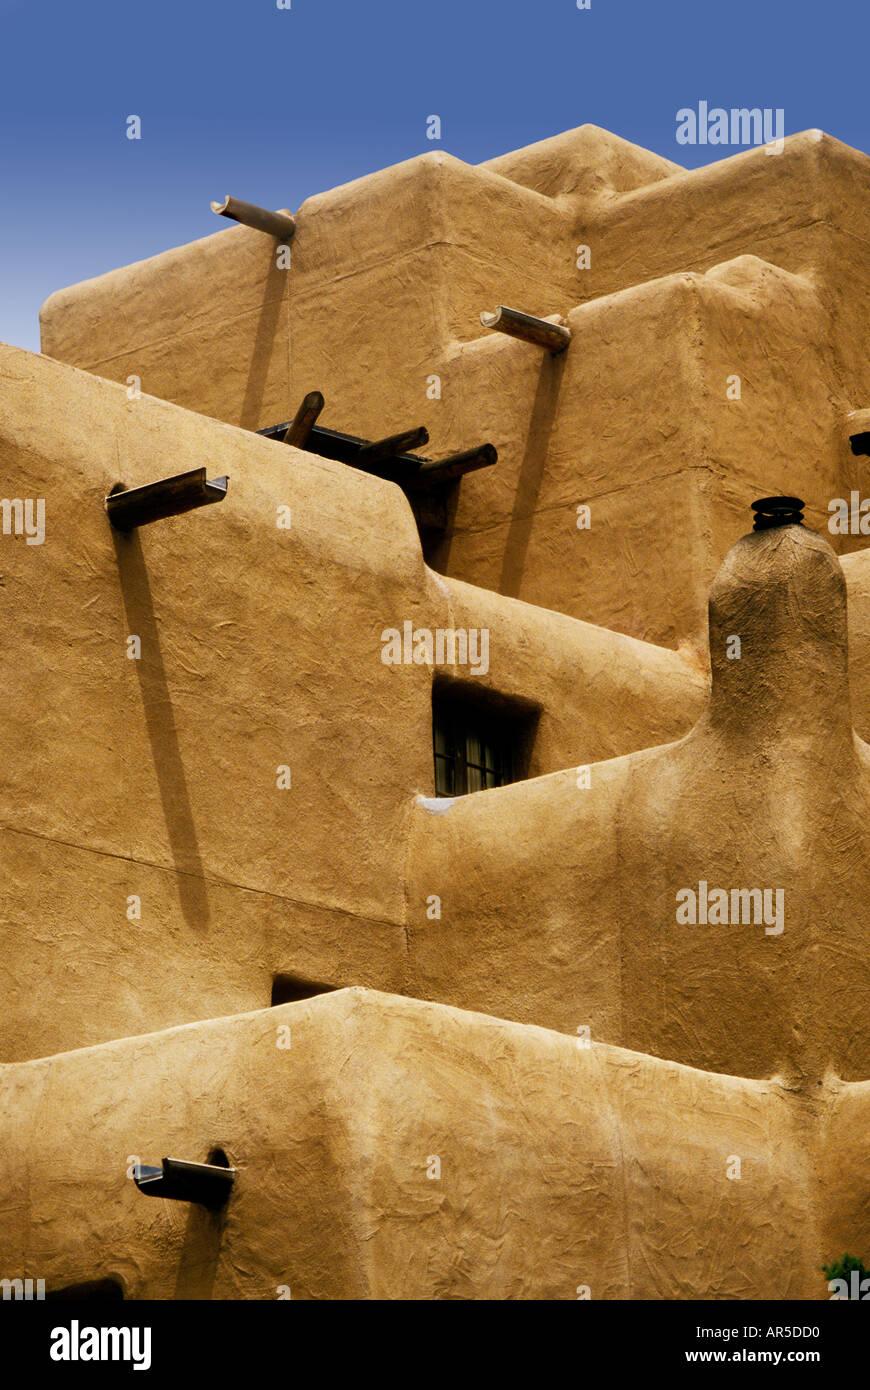 Moderna architettura adobe Santa Fe New Mexico USA Immagini Stock